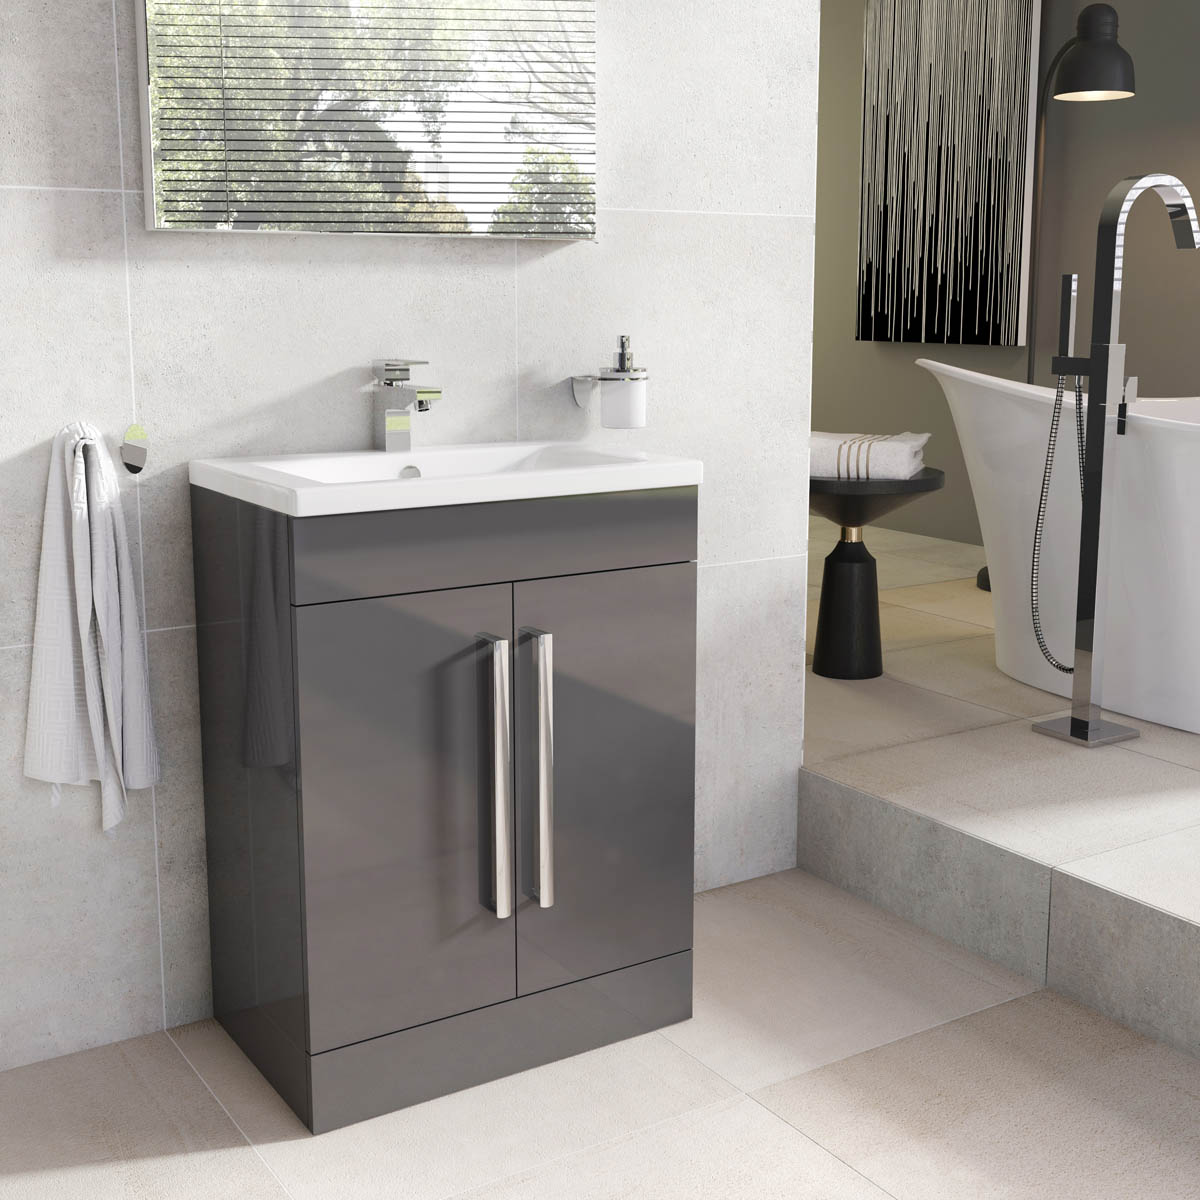 Bathroom vanity units image is loading newton-anthracite-gray-bathroom-standing-vanity unit- ZGEXQAC